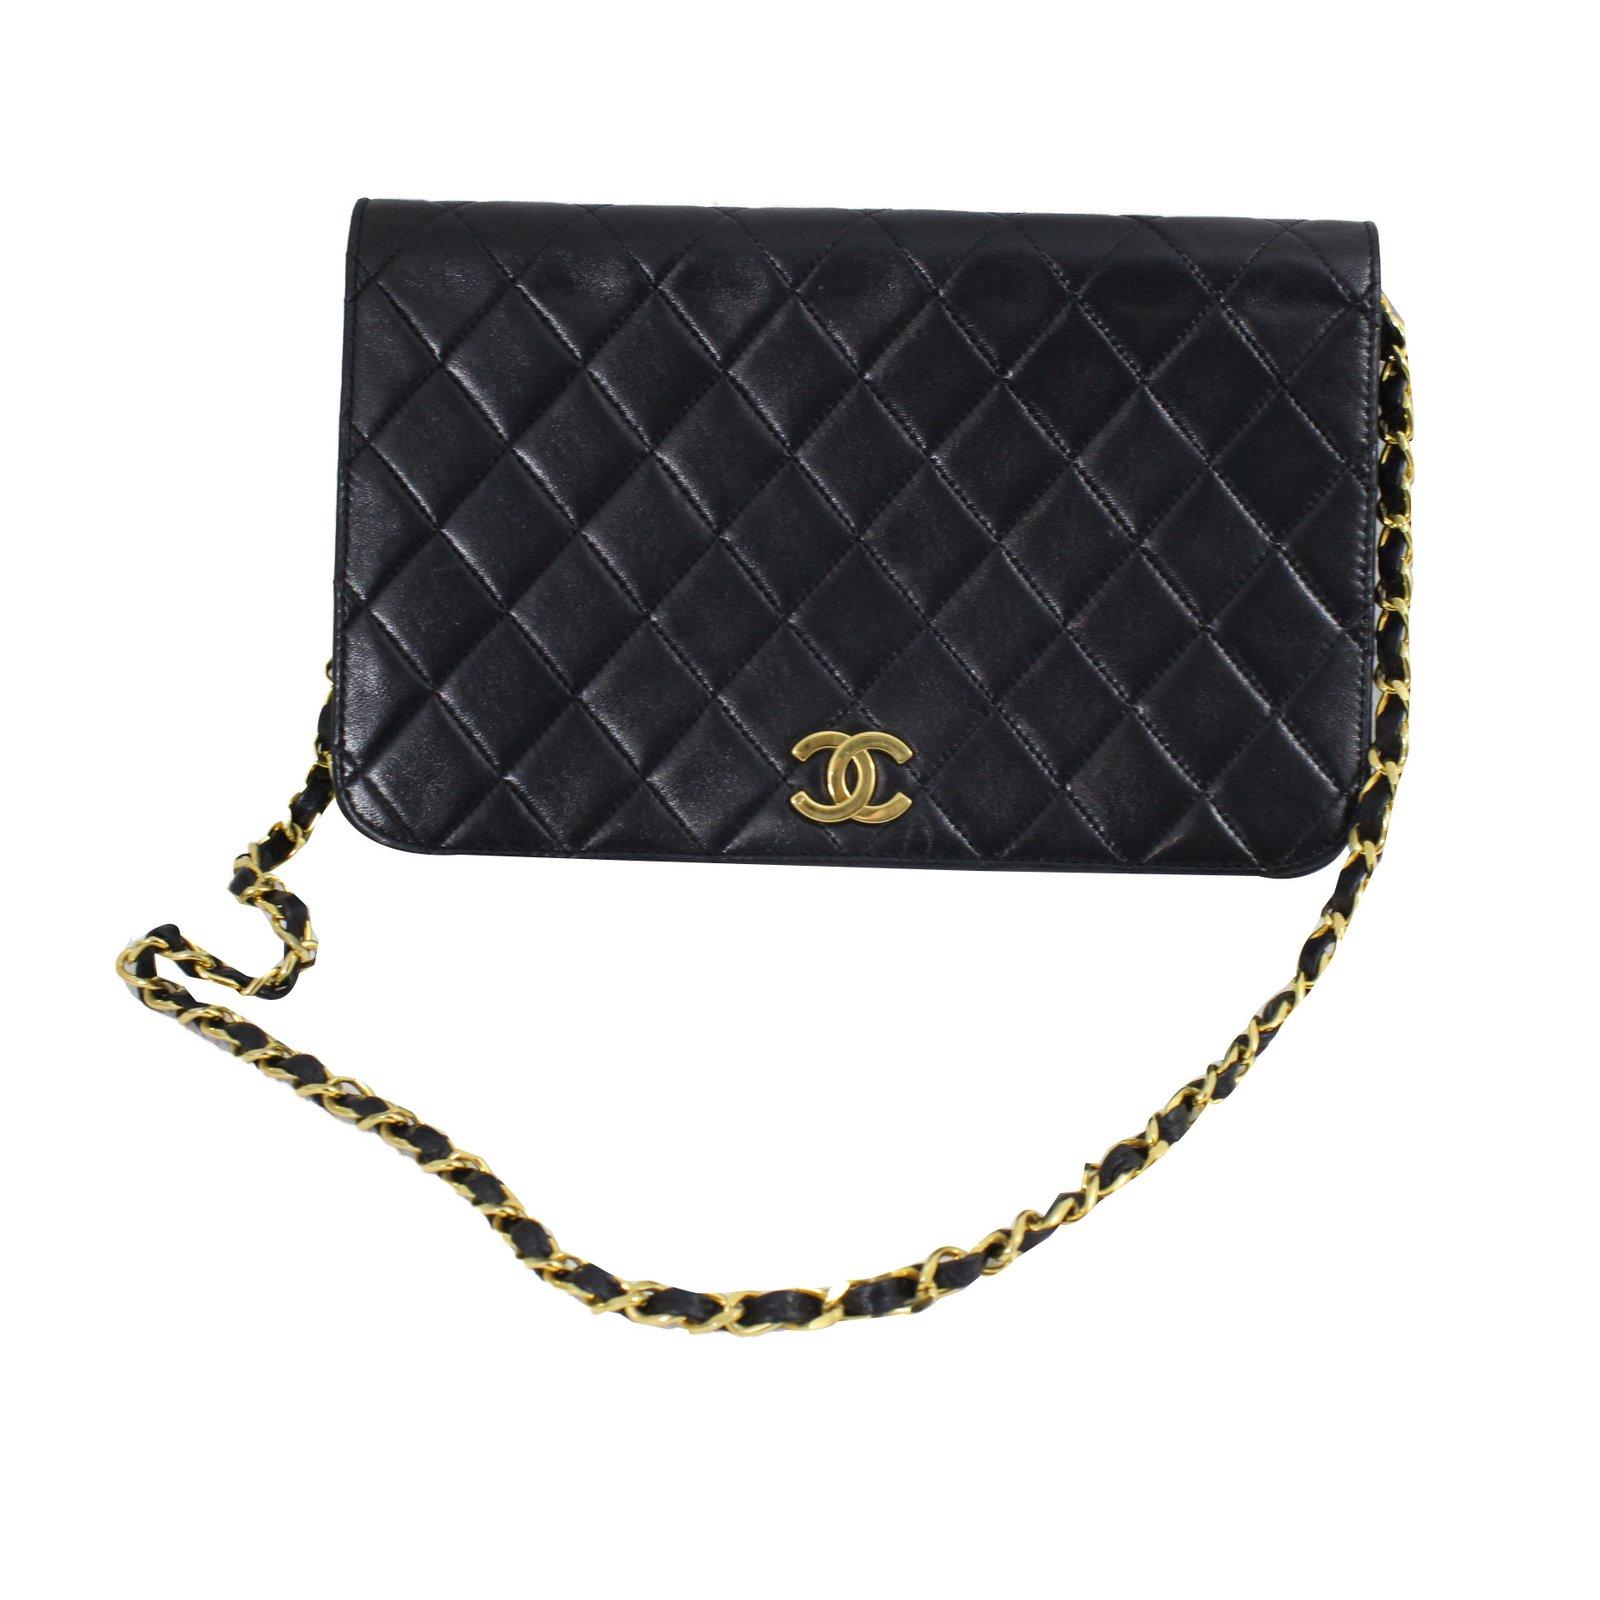 c3d61b337776 Chanel WOC vintage Handbags Patent leather Black ref.49144 - Joli Closet